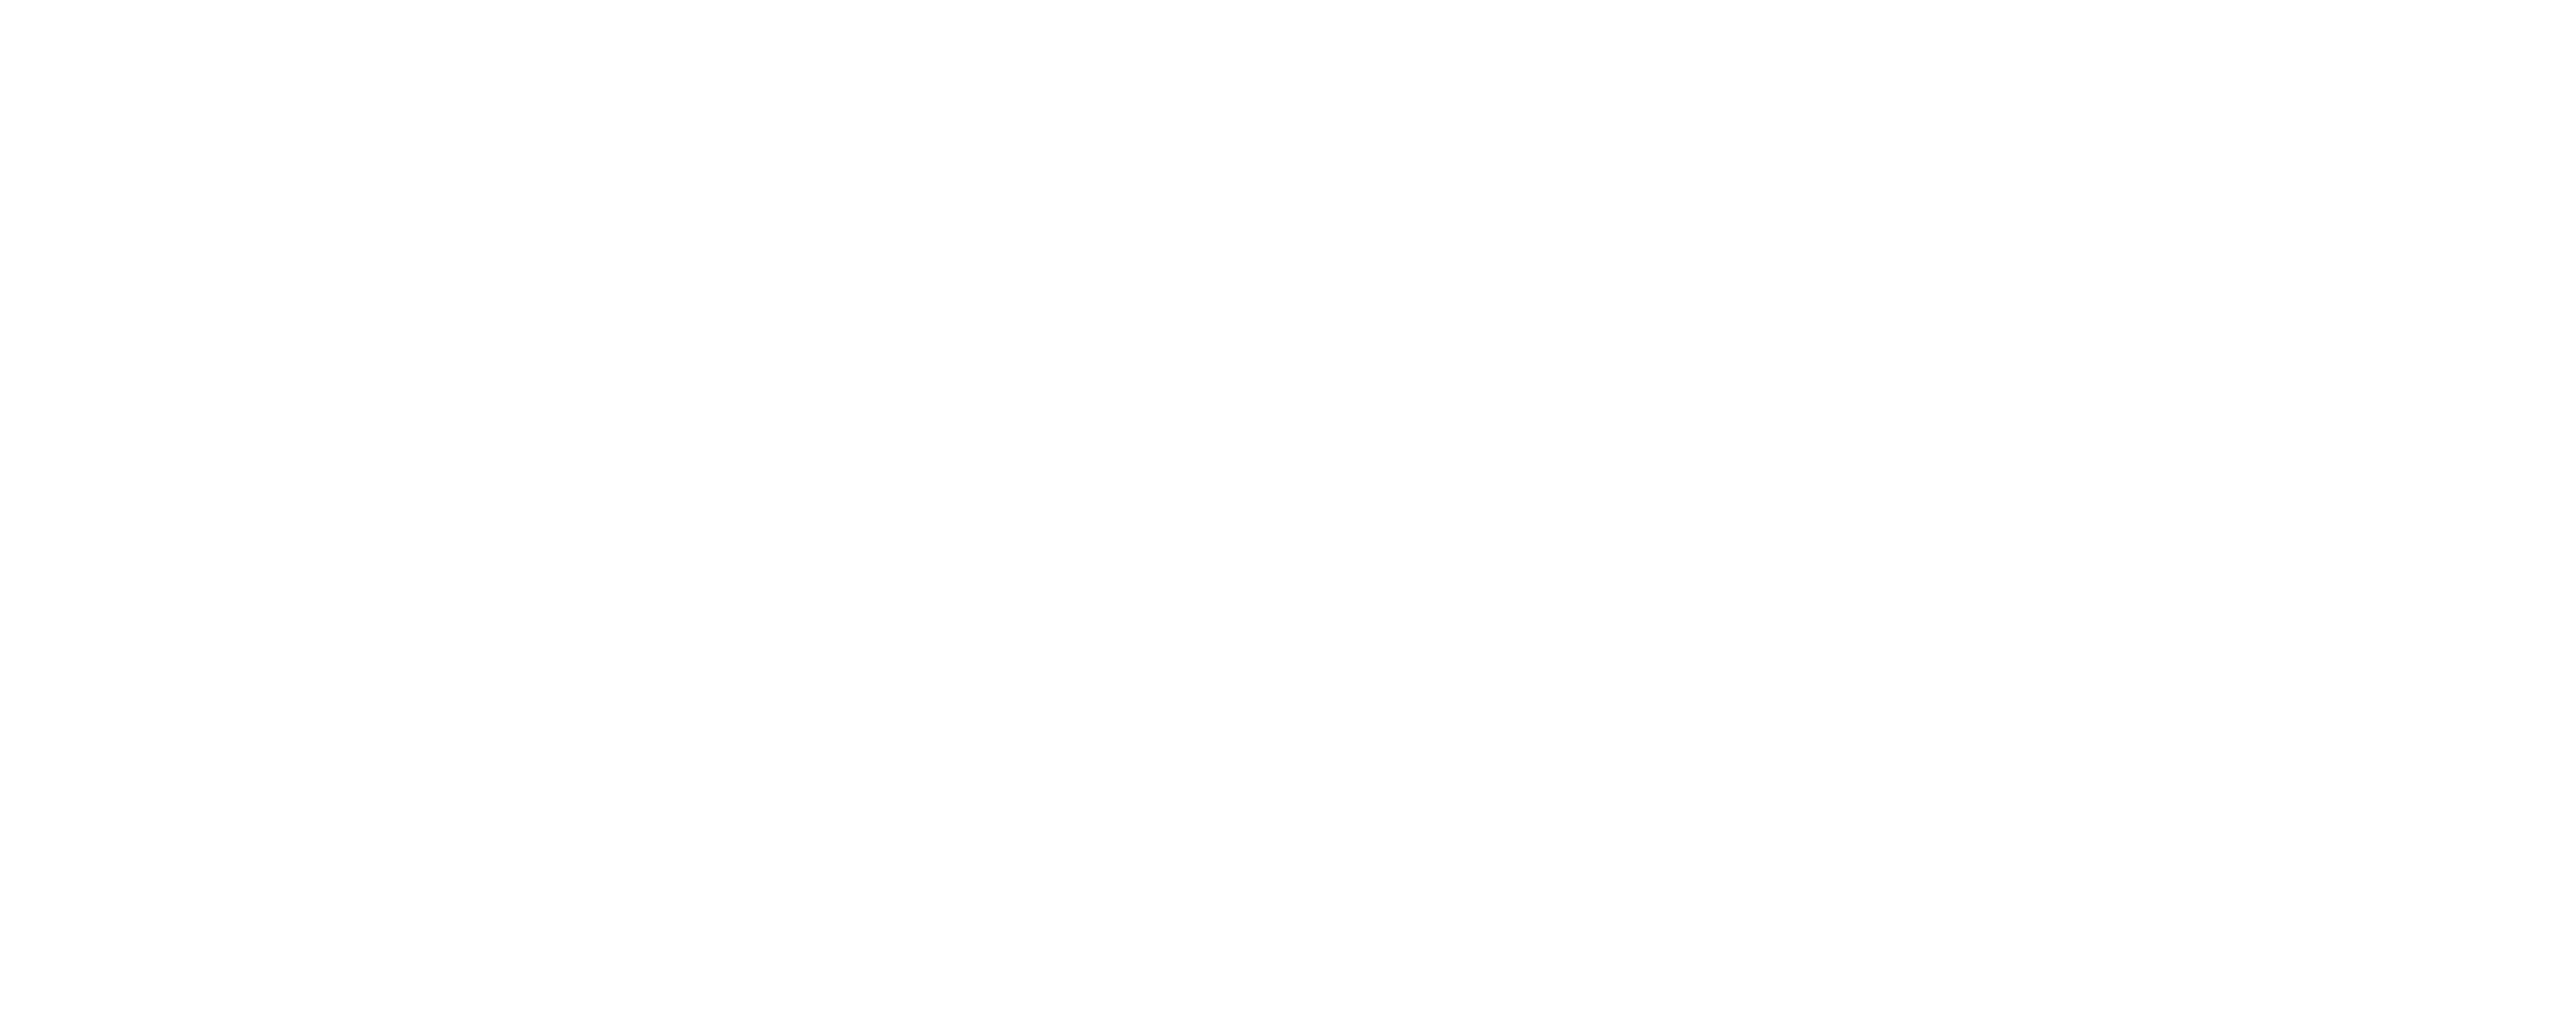 B2 Project